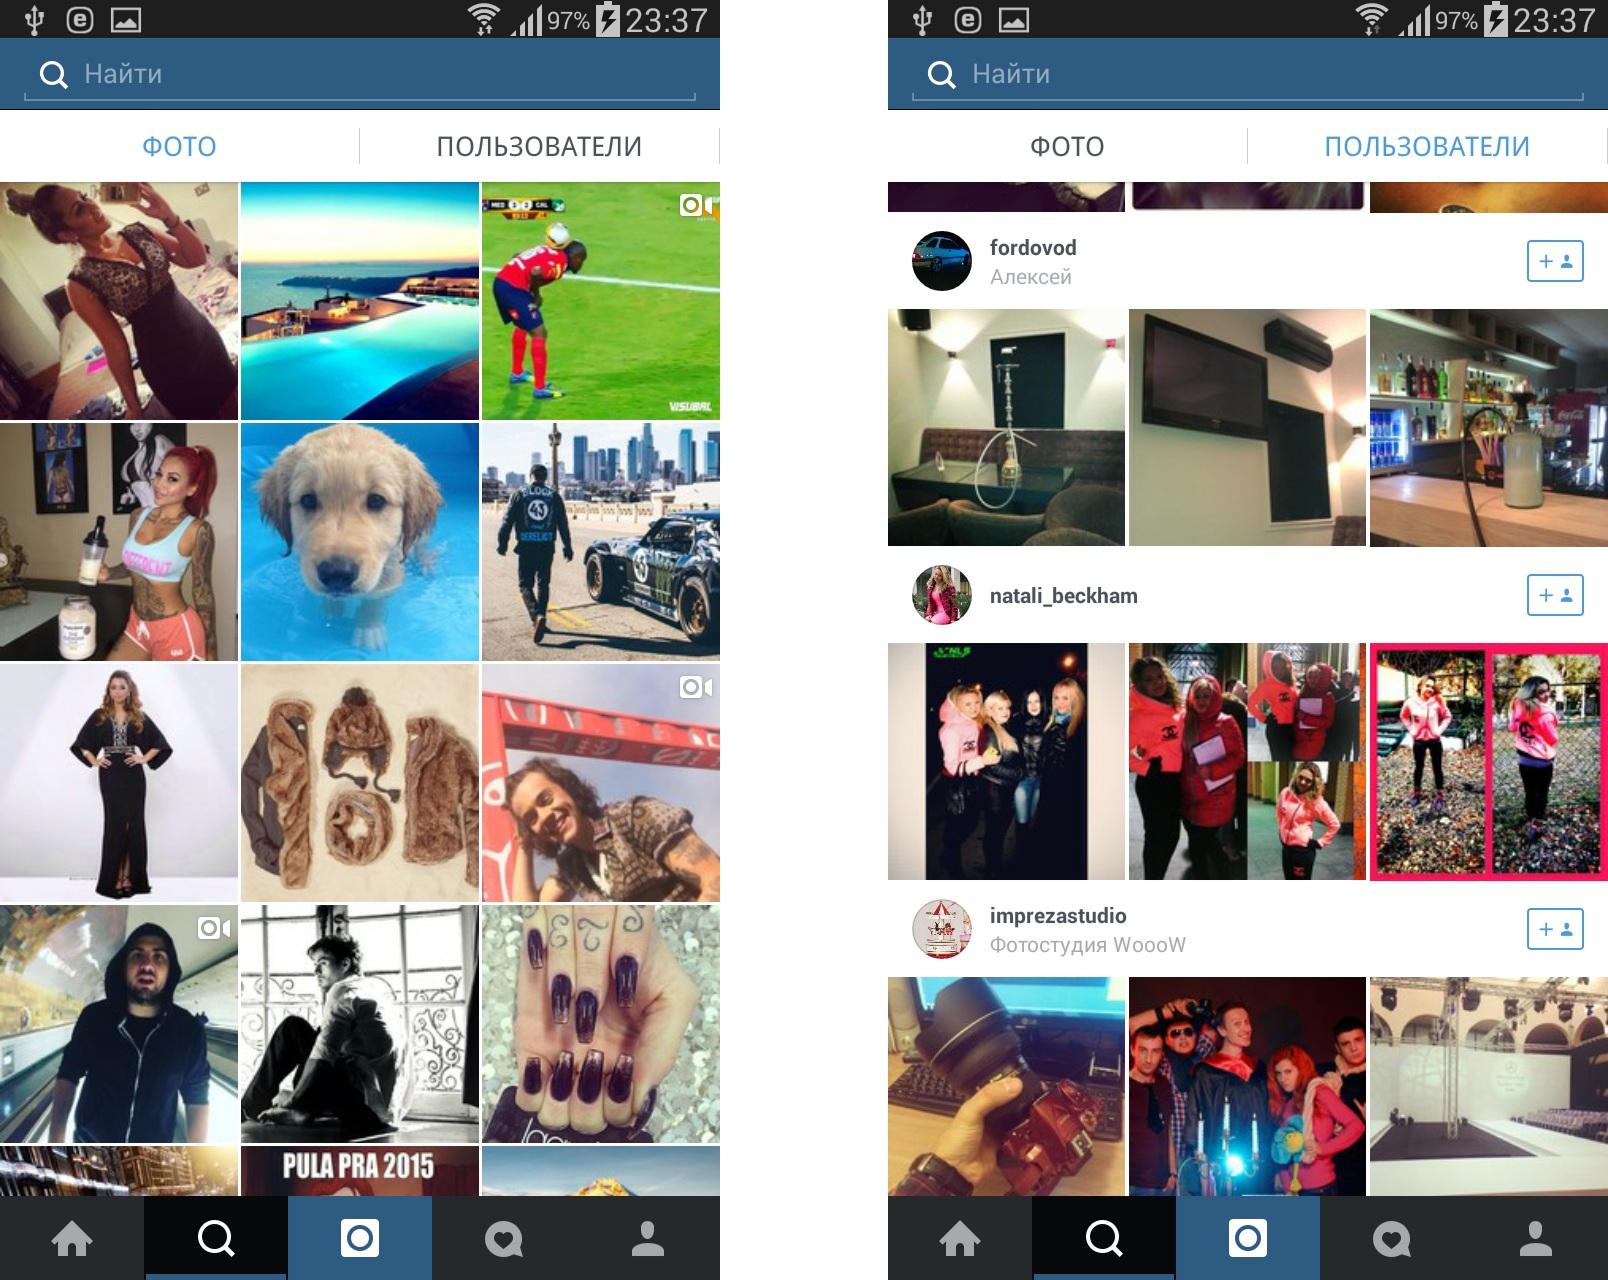 ТОП-20 приложений для Android - Instagram